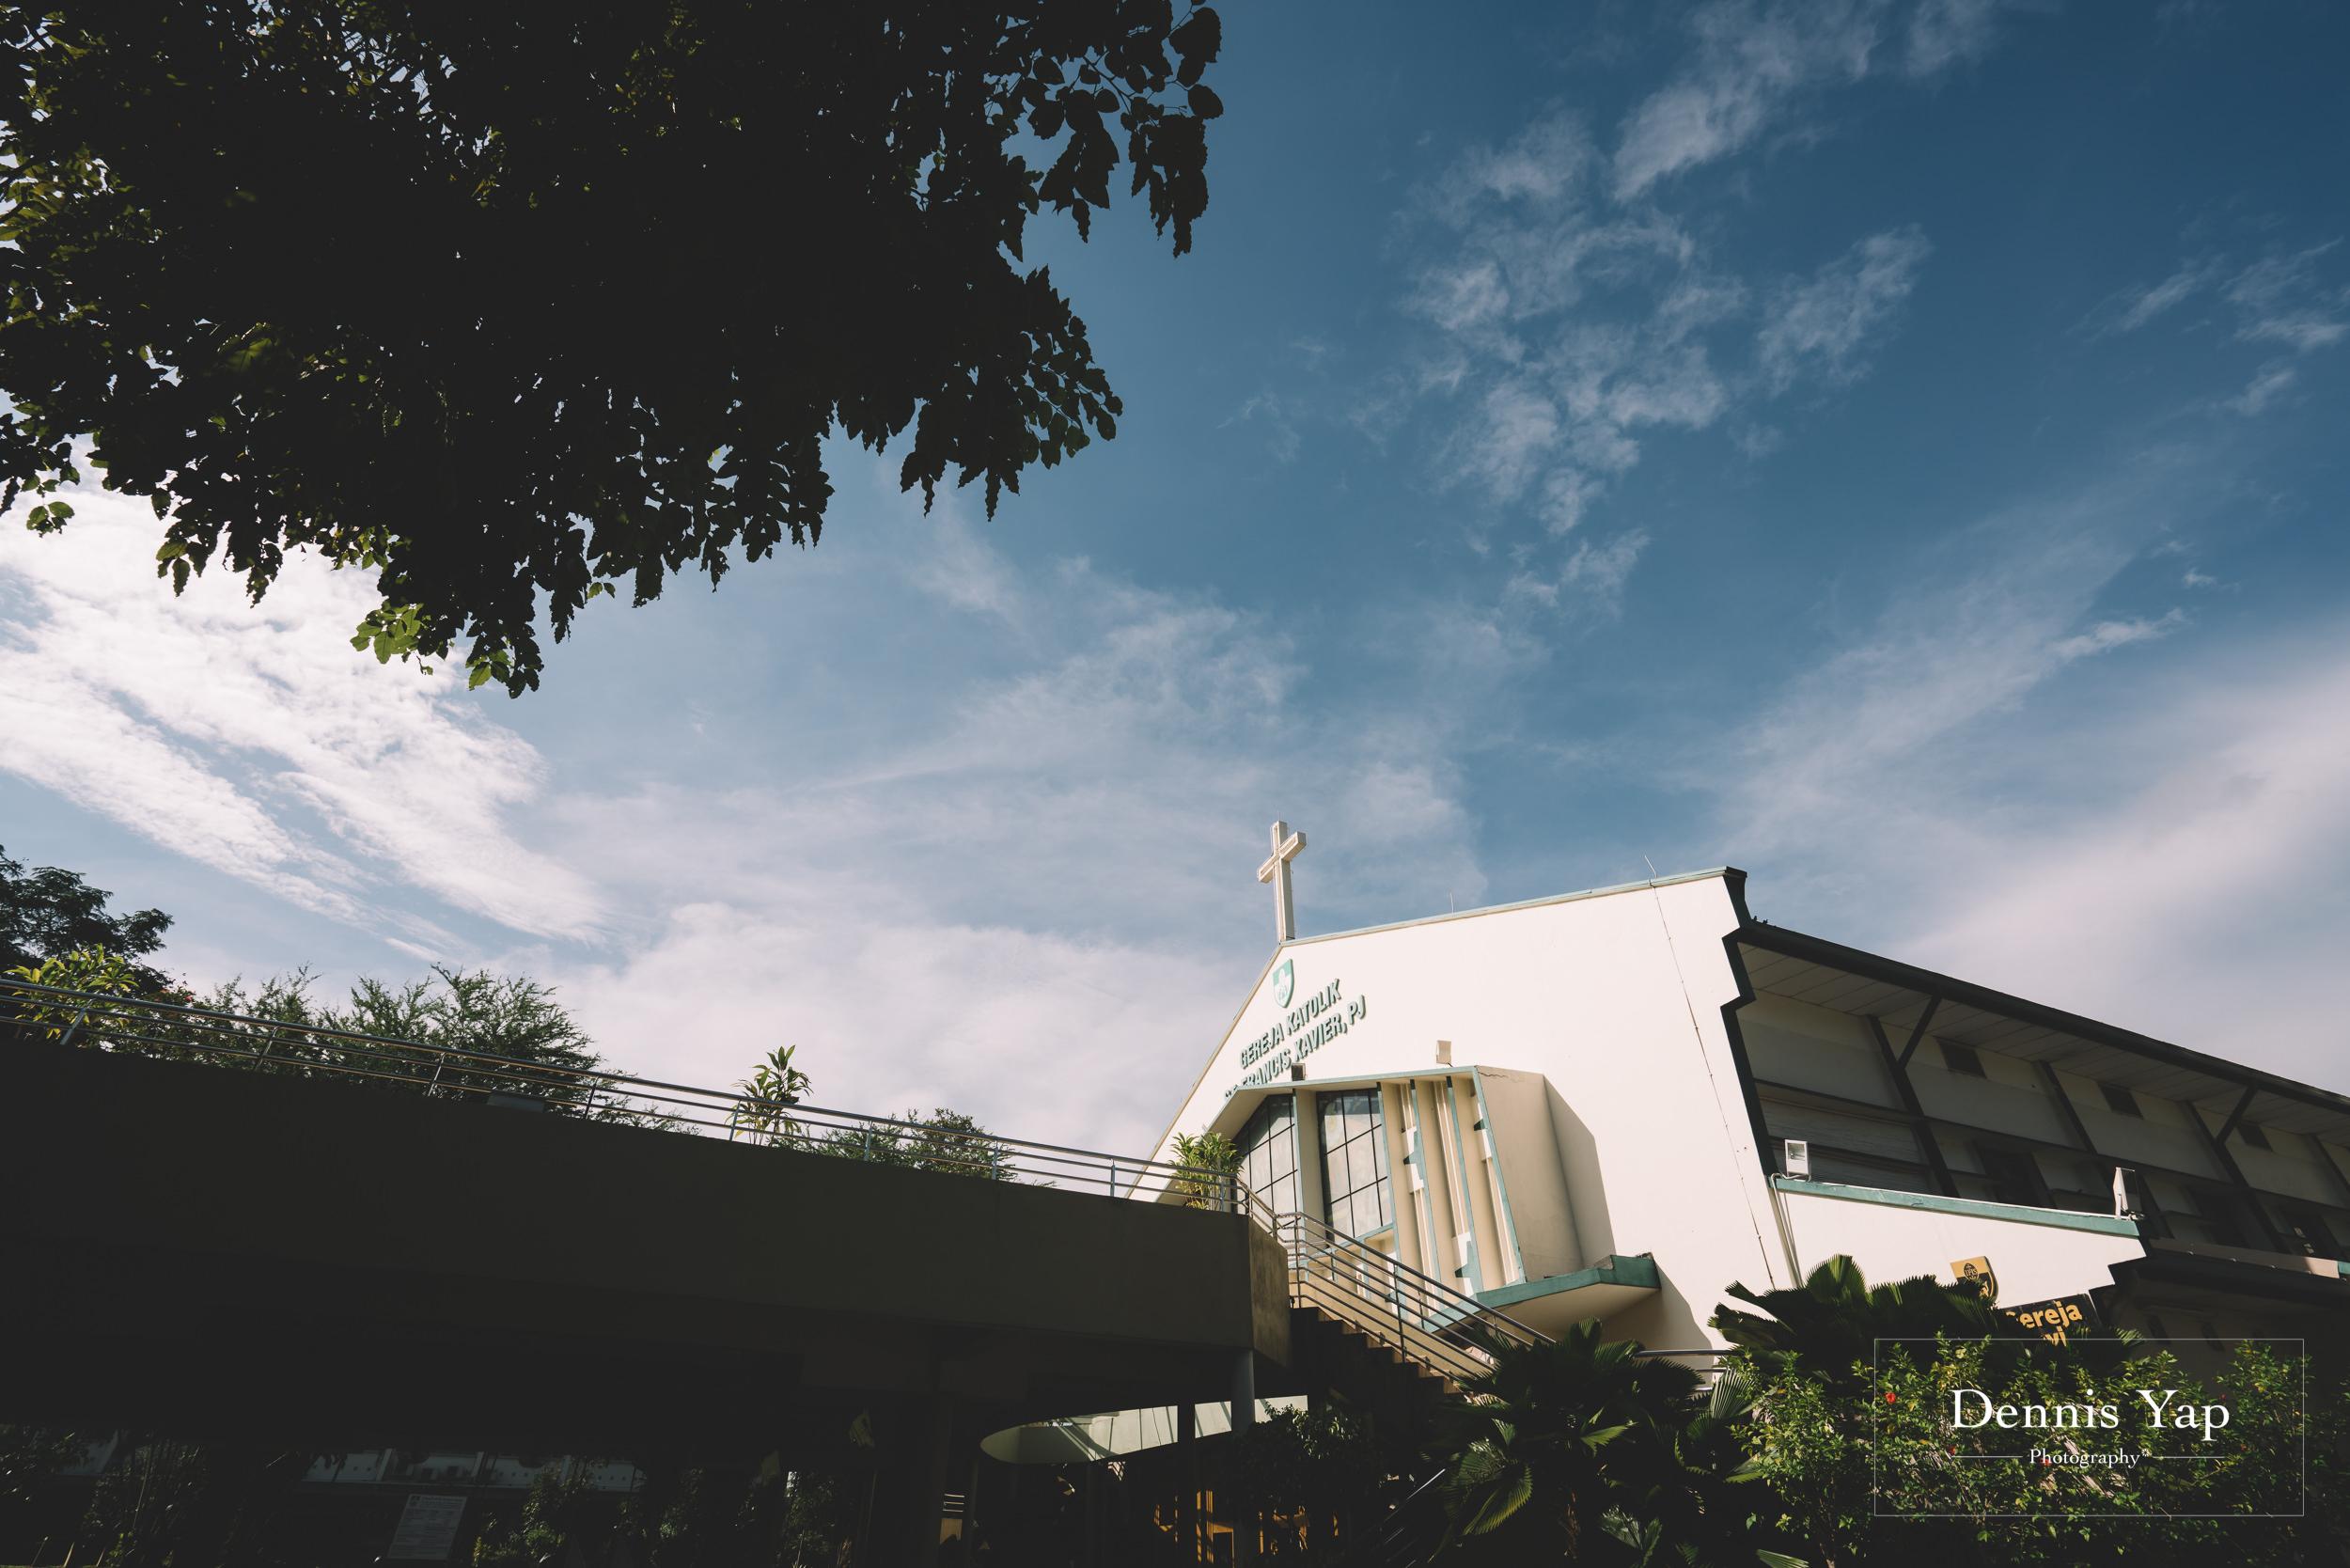 jinhan jacqui church wedding xavier catholic dennis yap photography malaysia wedding photographer-9.jpg